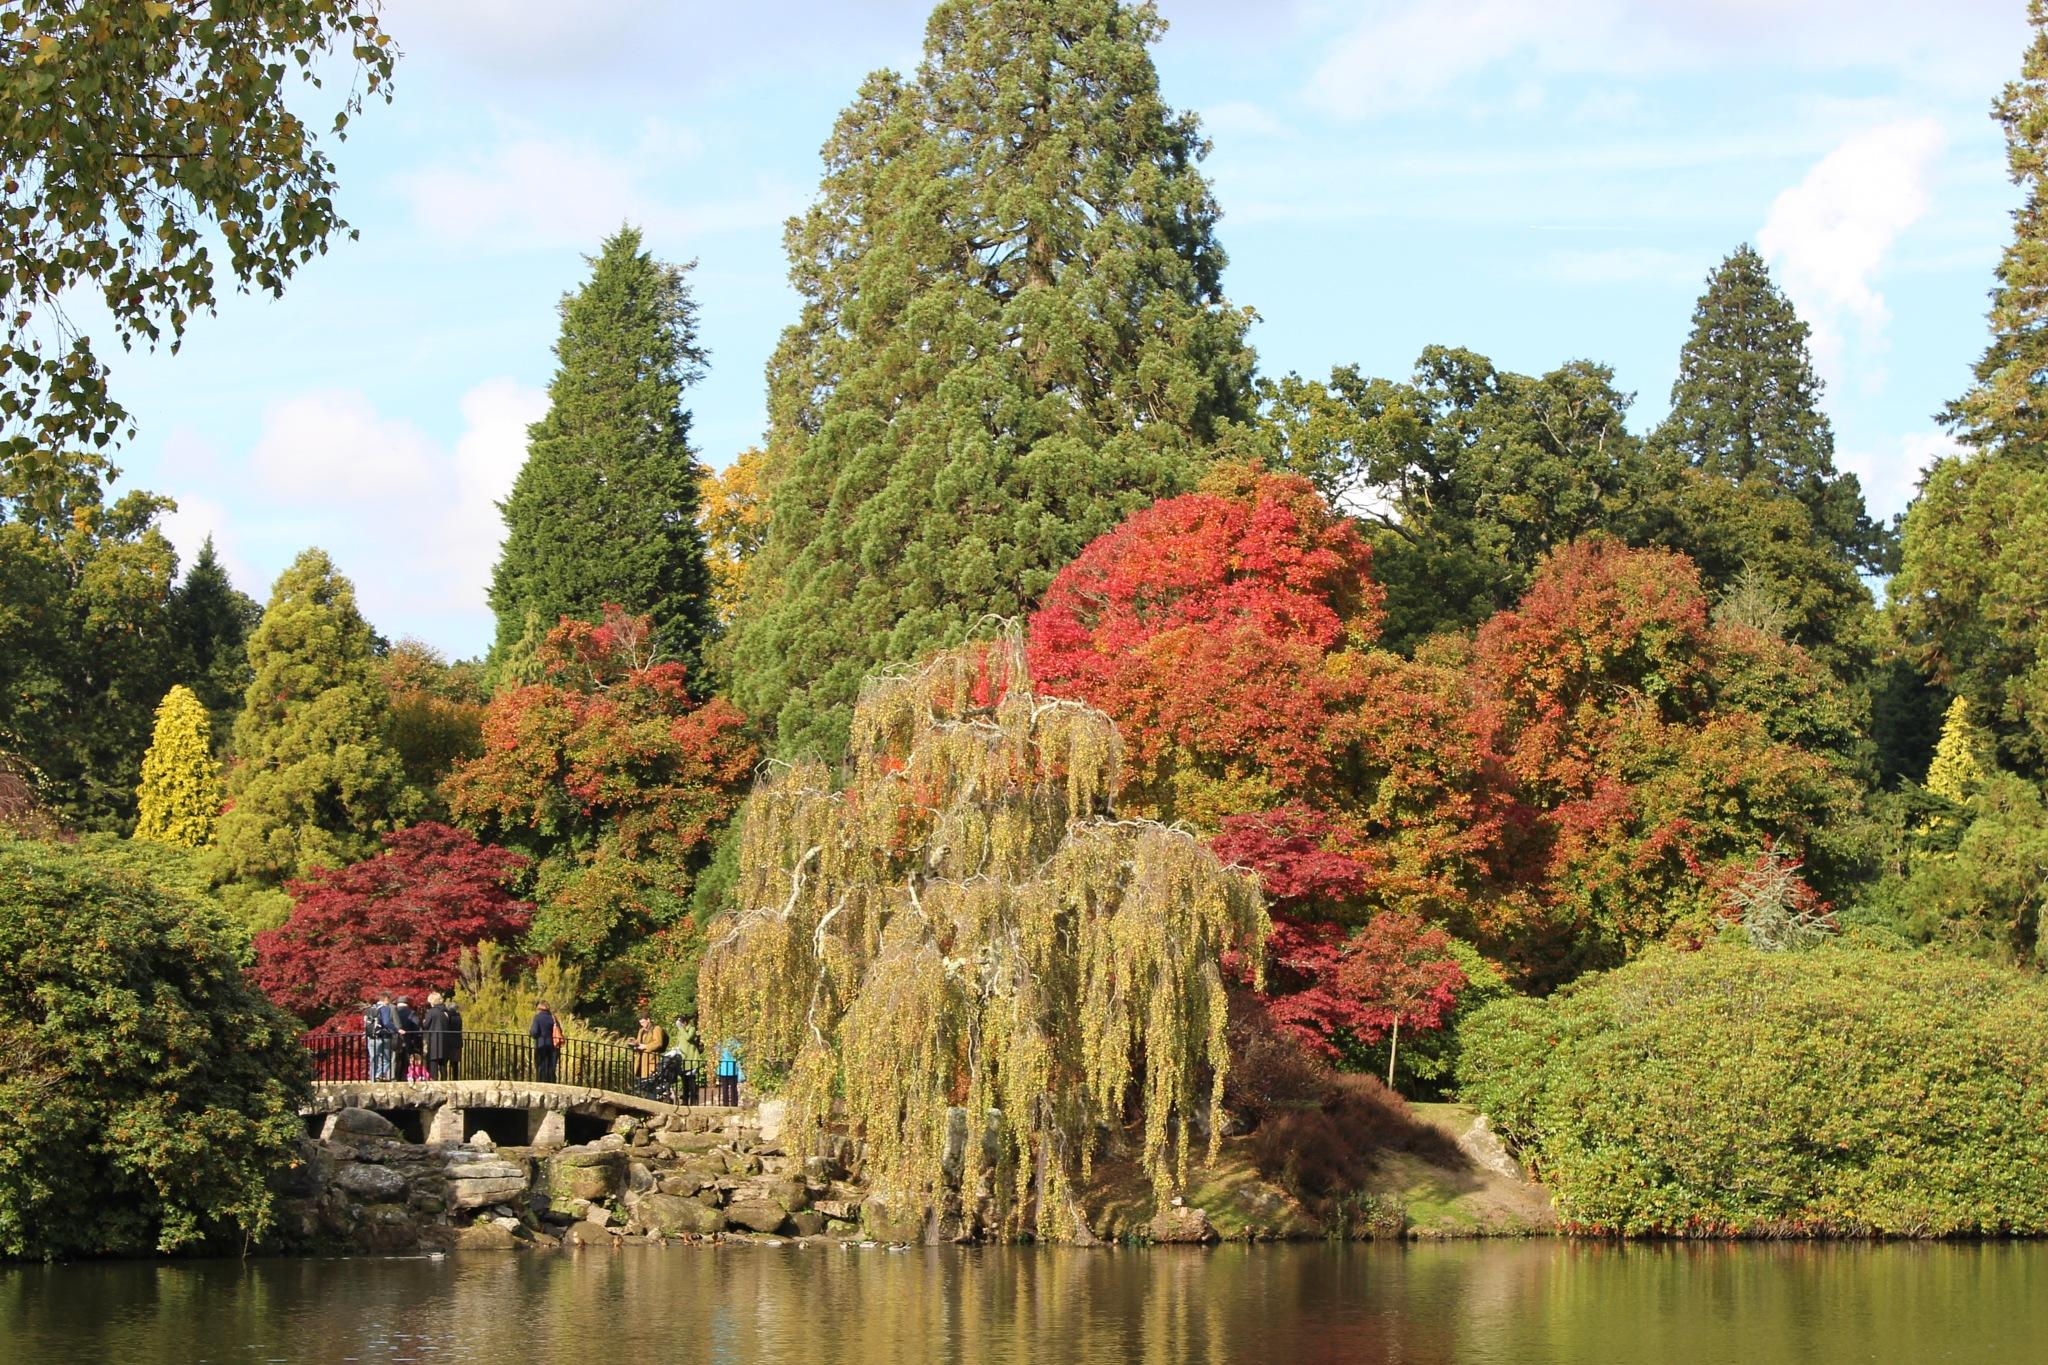 Autumn leaves by Yvonne Clover-Lambert